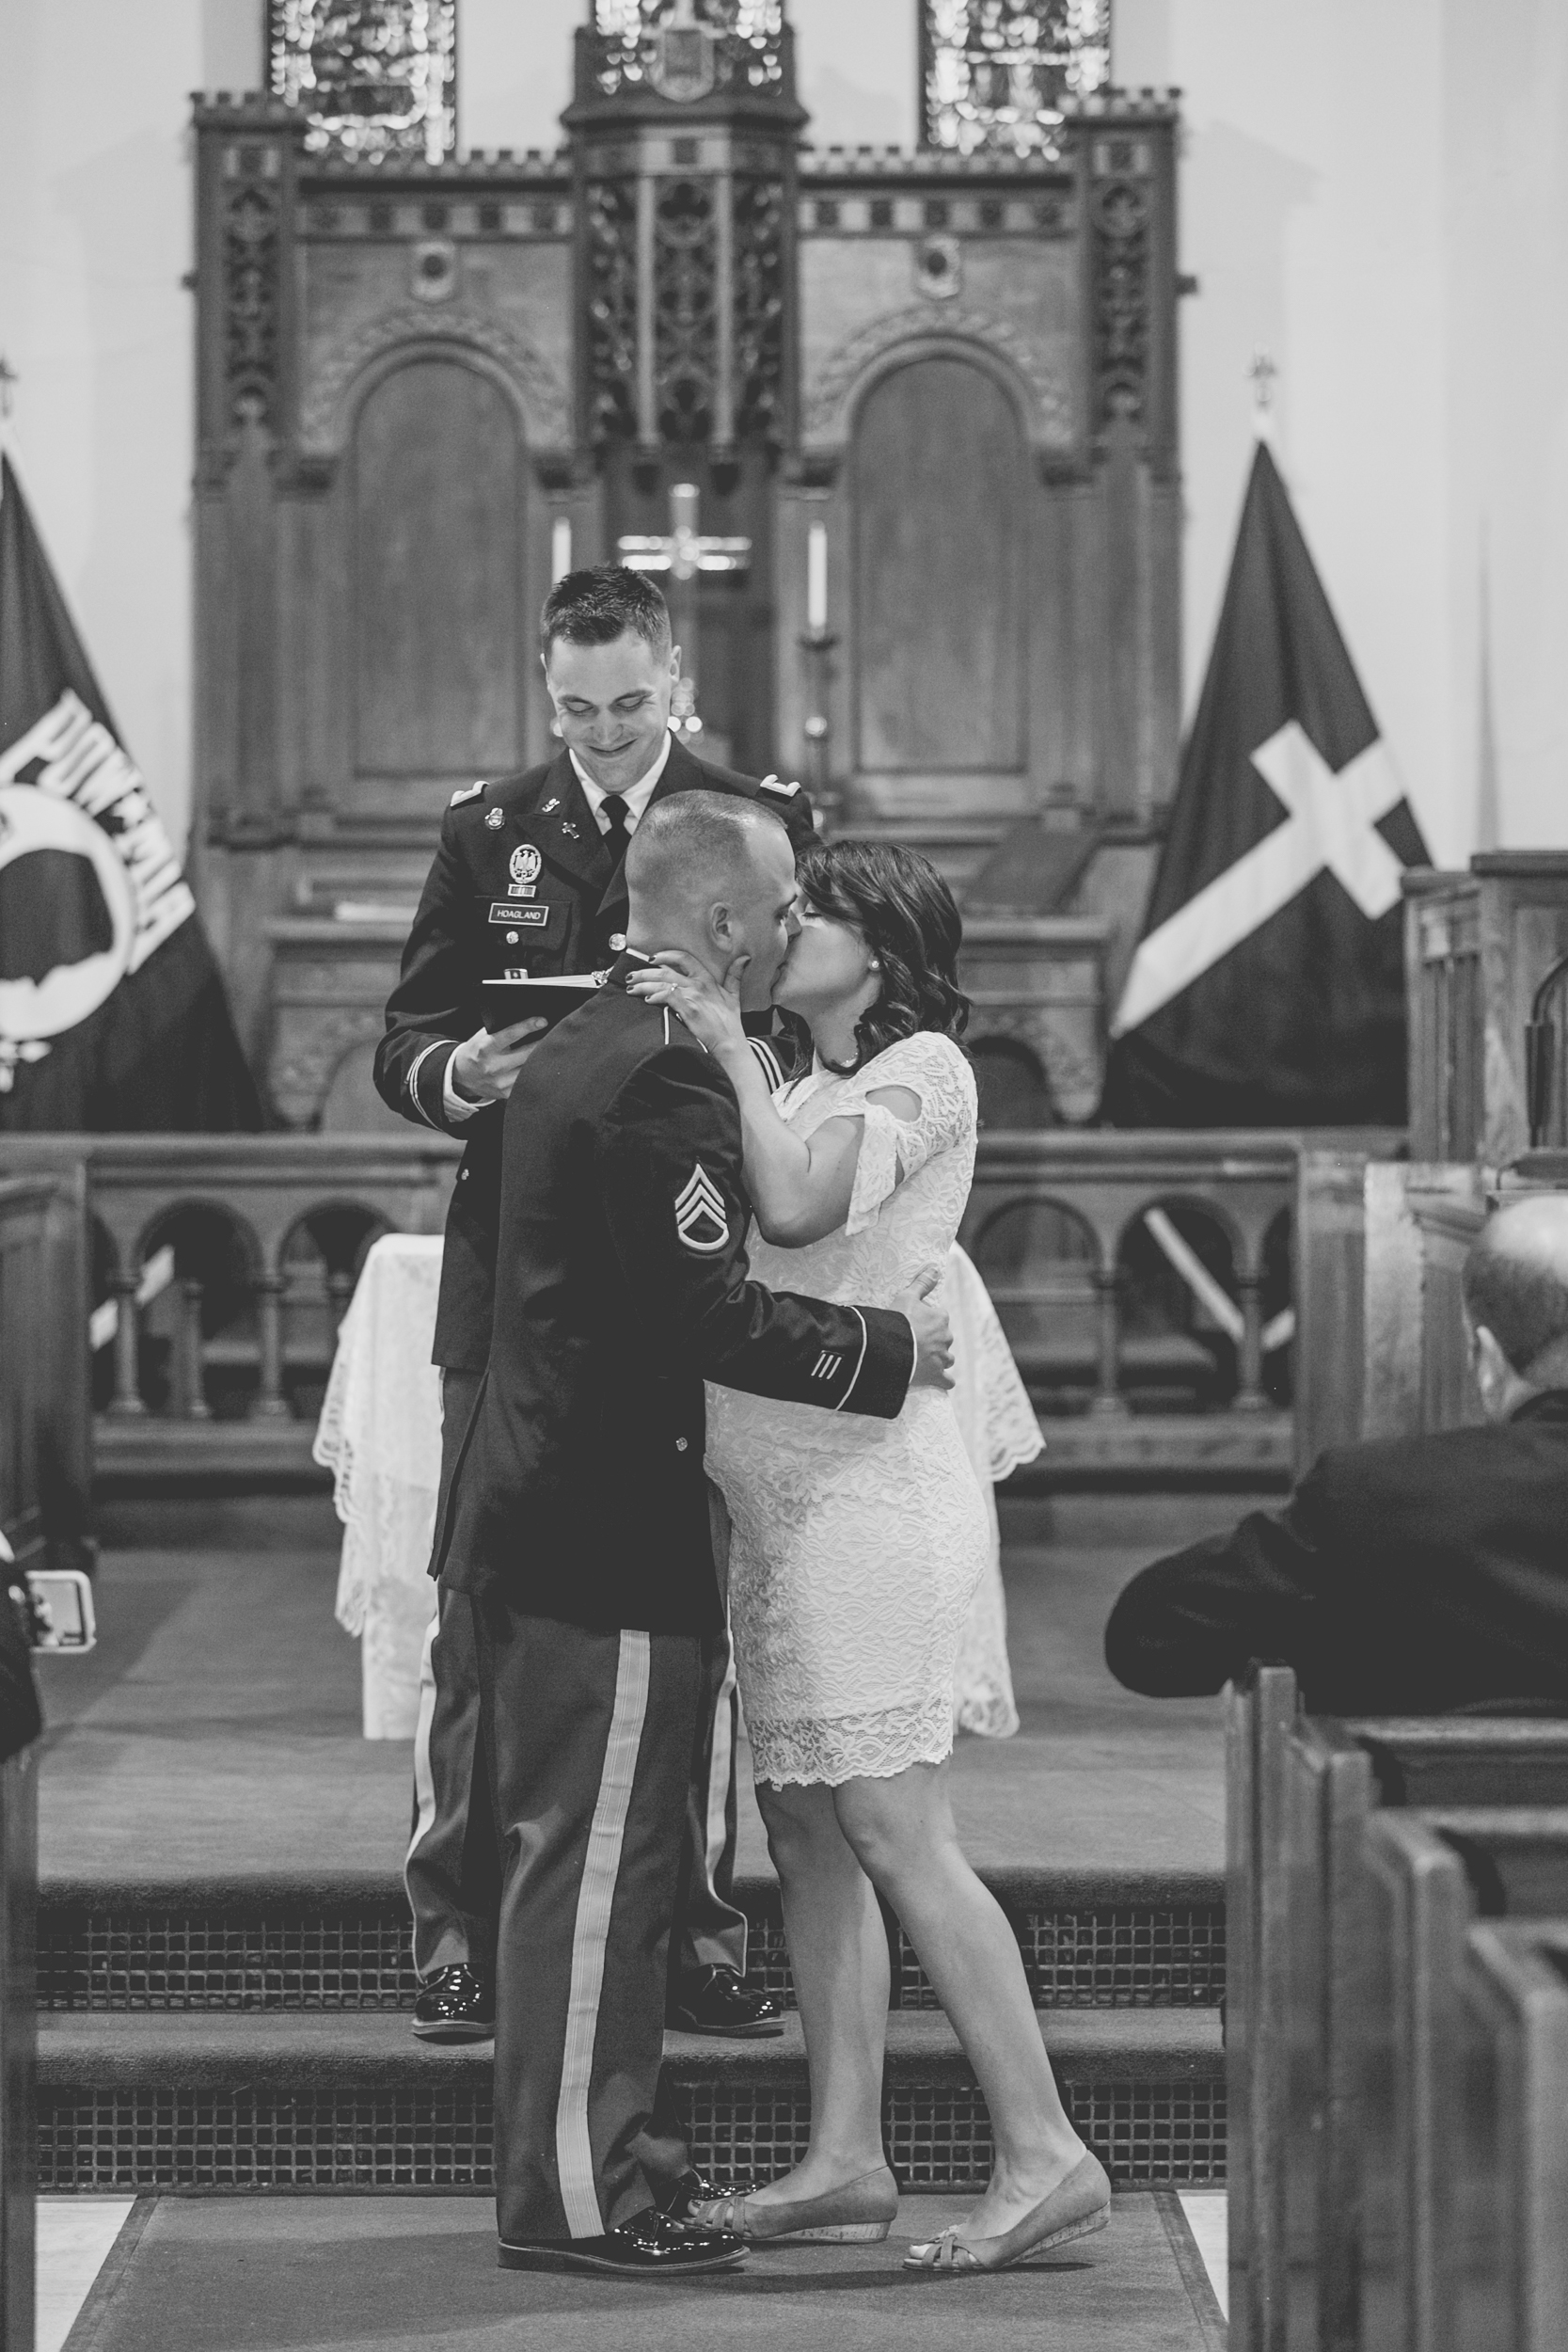 Fort Snelling Elopement St. Paul, MN, Fort Snelling Elopement, Military Elopement, Intimate Military Wedding, intimate elopement wedding-www.rachelsmak.com31.jpg